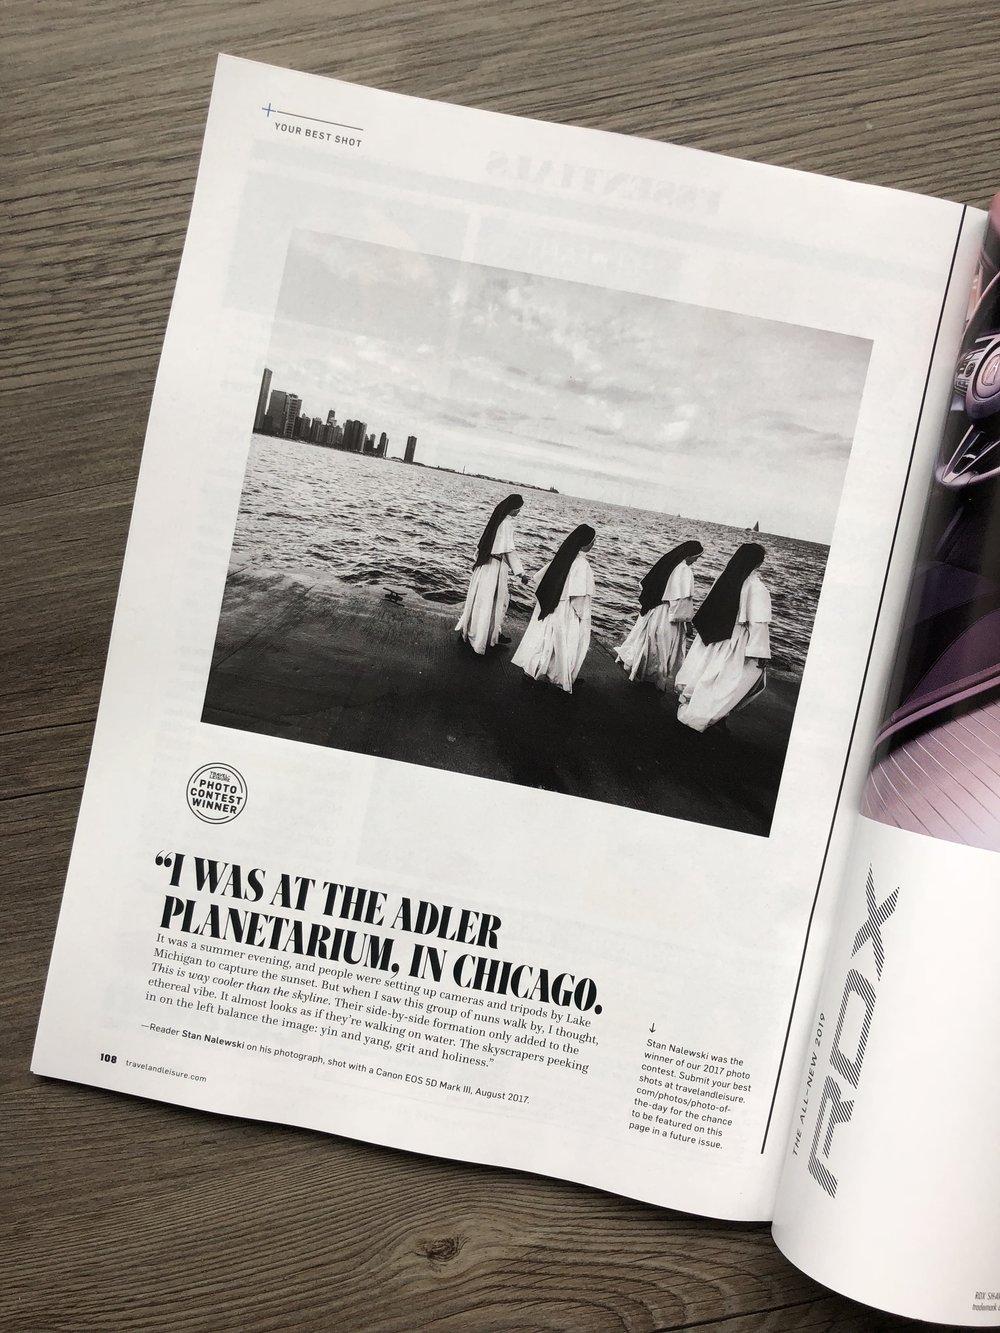 StanNalewski_TandLMagazine2.JPG